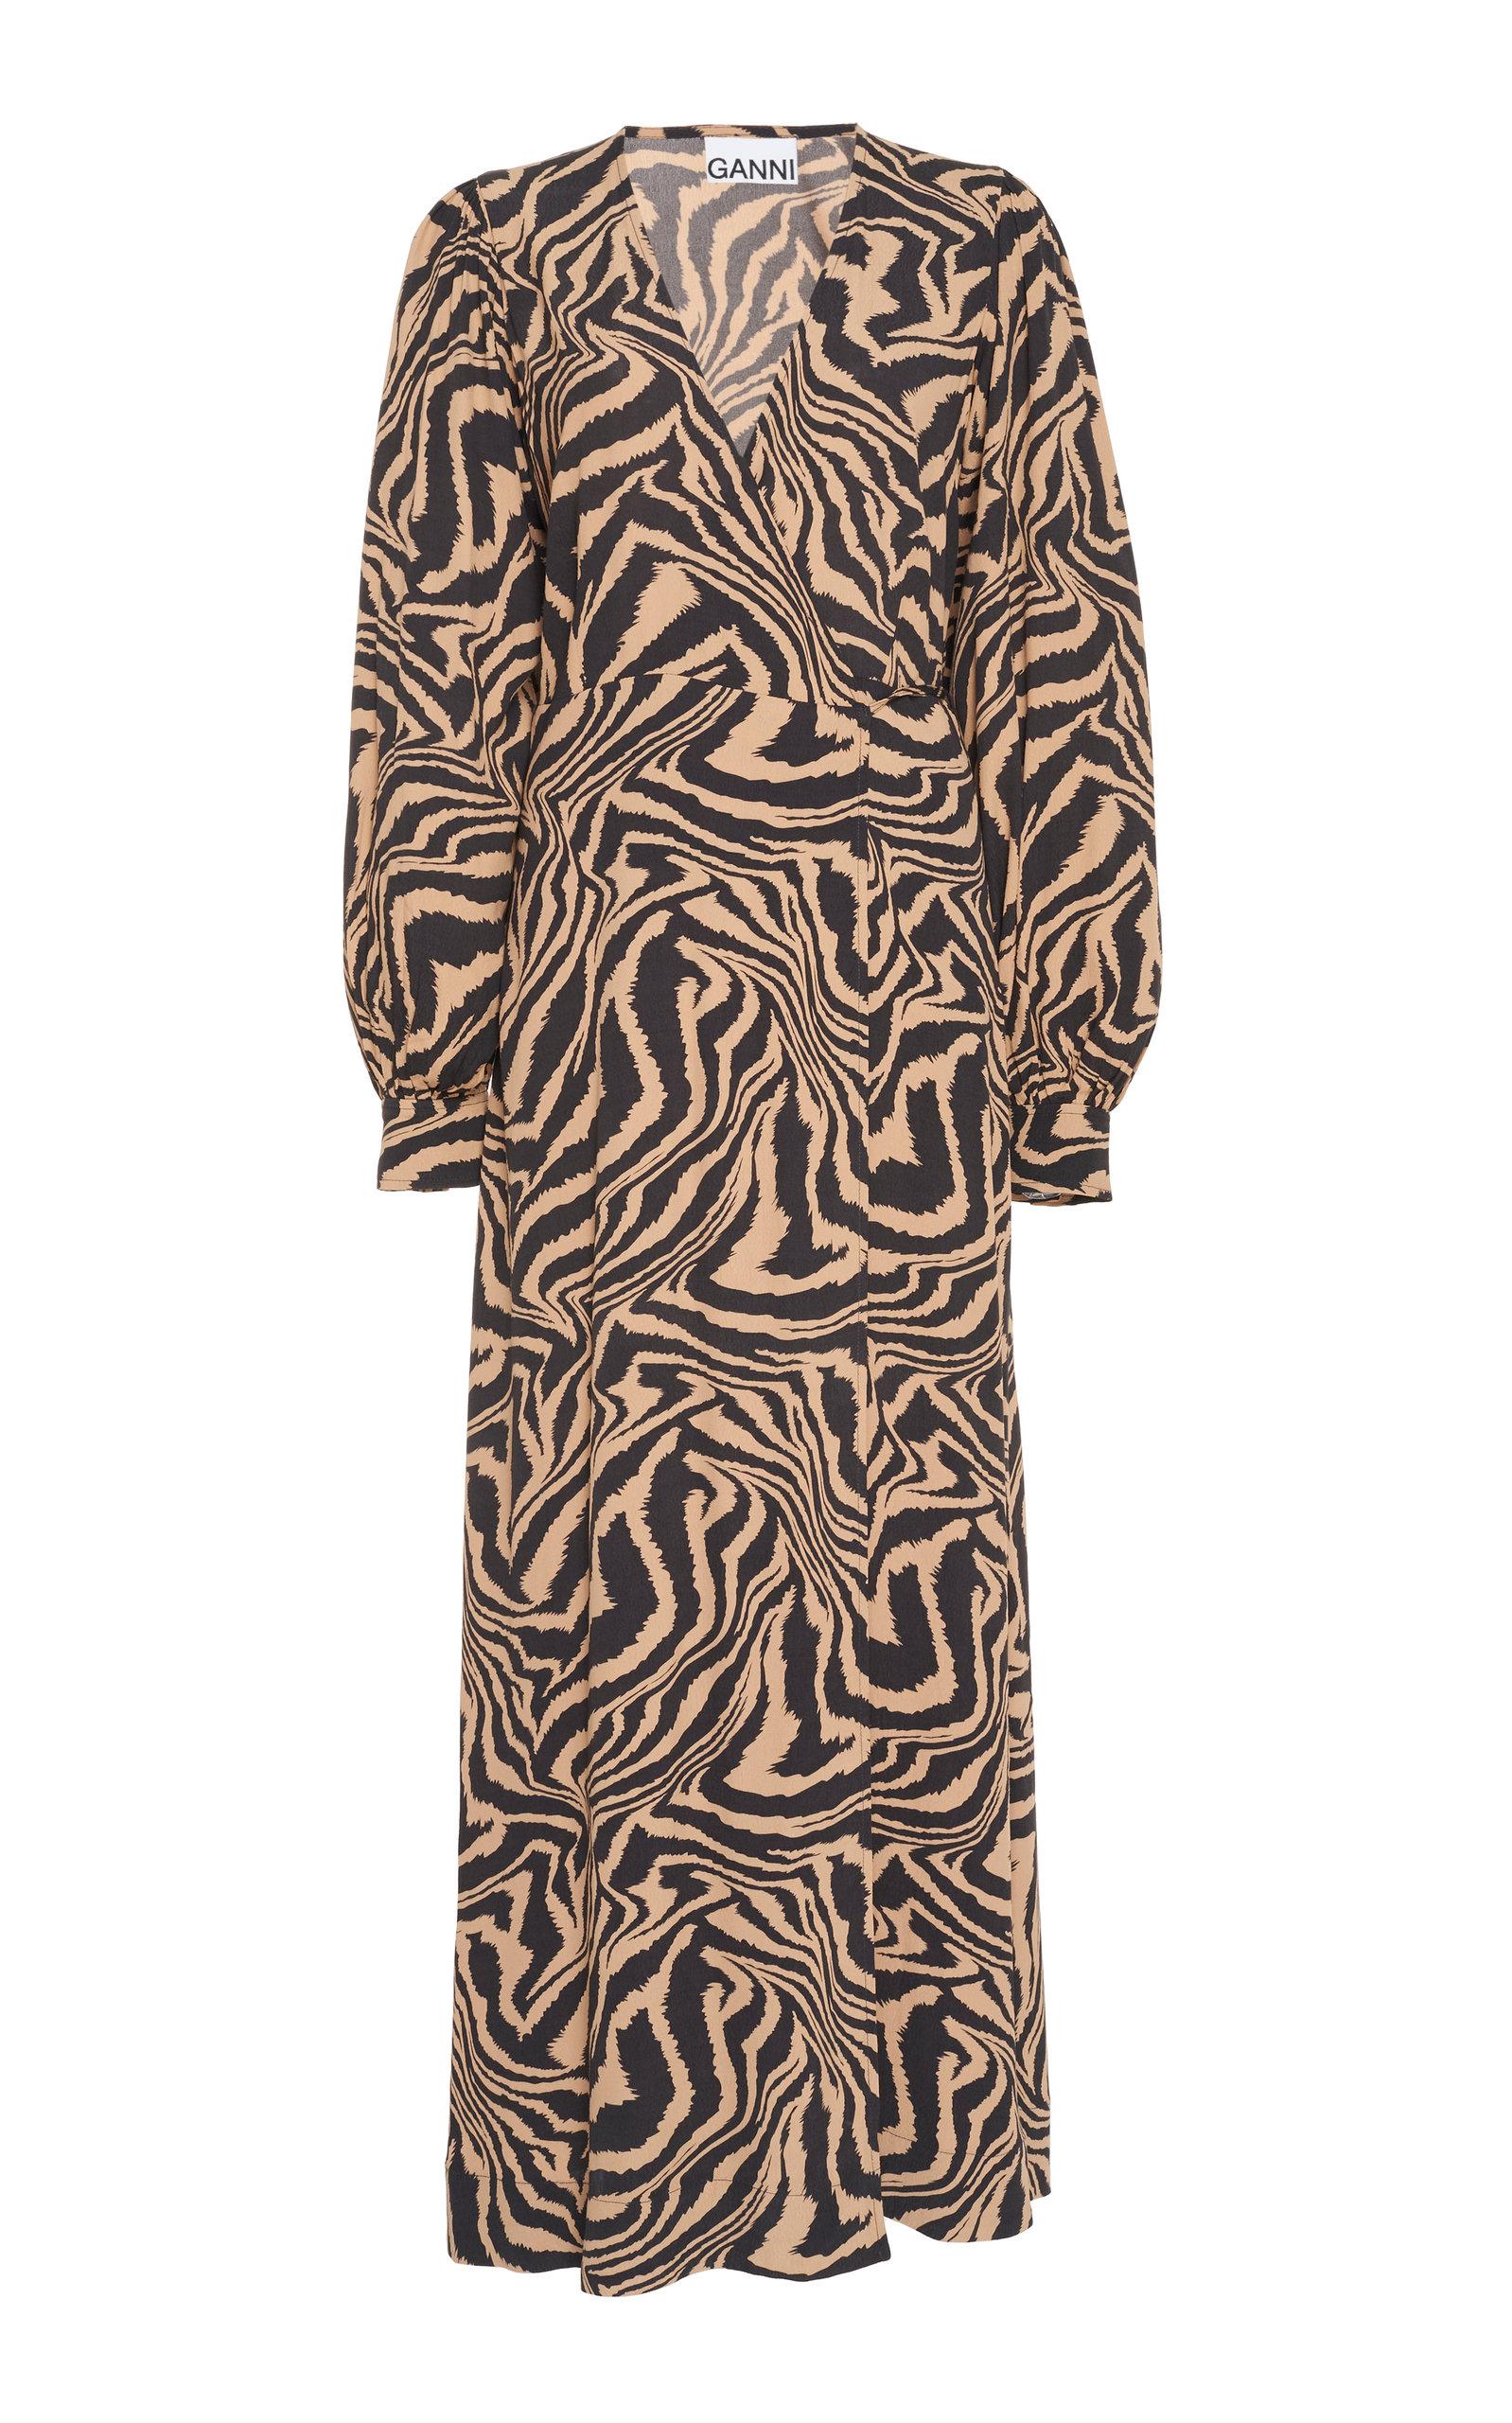 Buy Ganni Animal-Print Crepe Wrap Dress online, shop Ganni at the best price